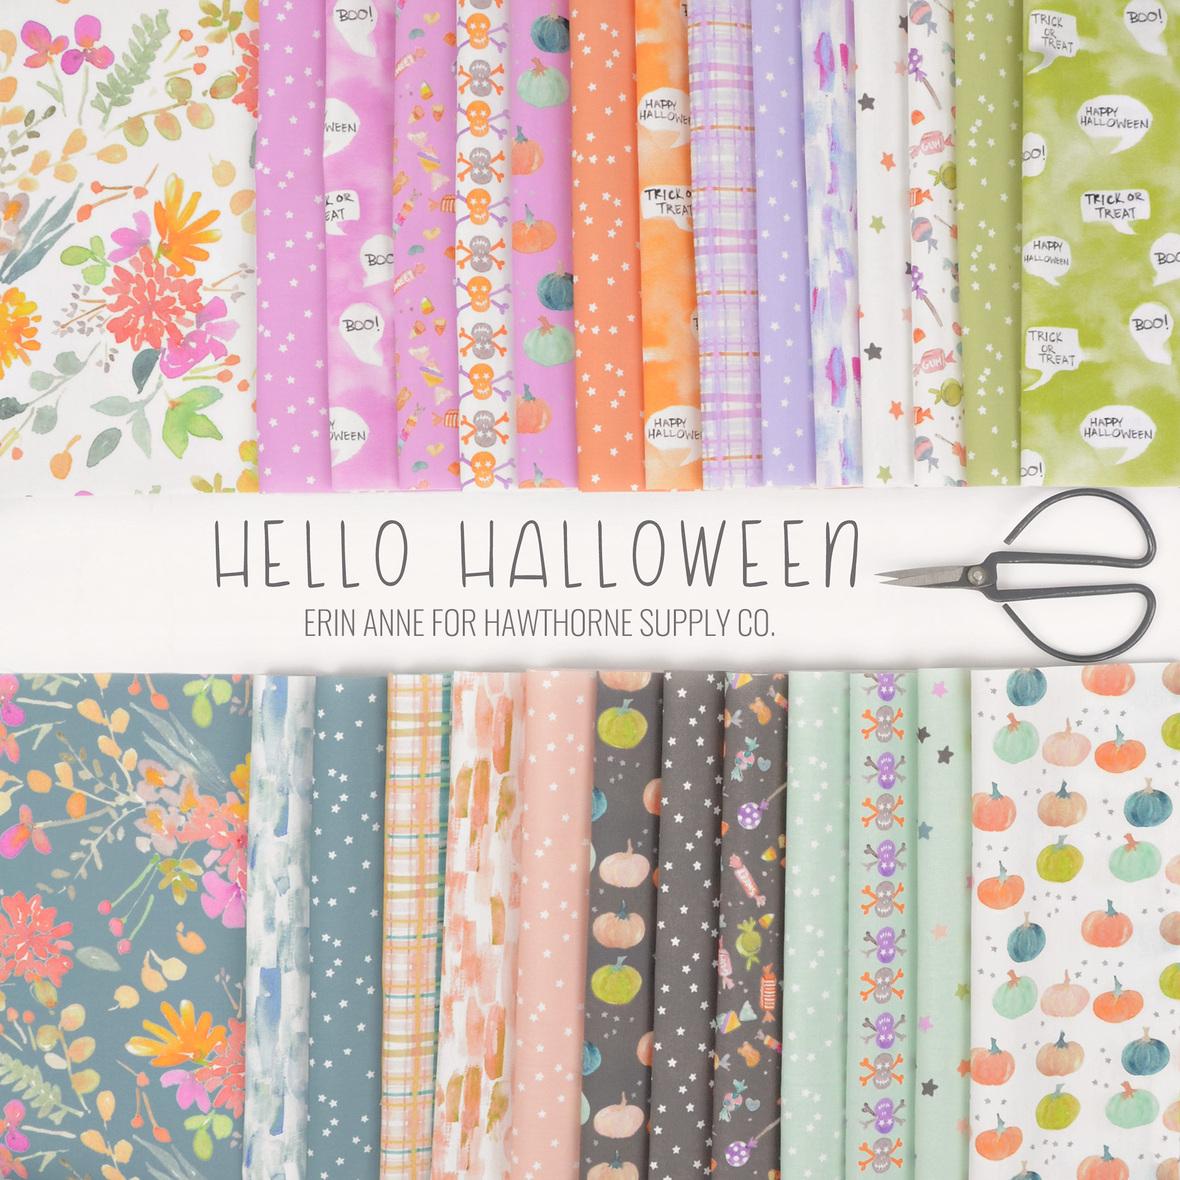 Hello Halloween fabric by Erin Anne for Hathorne Supply Co